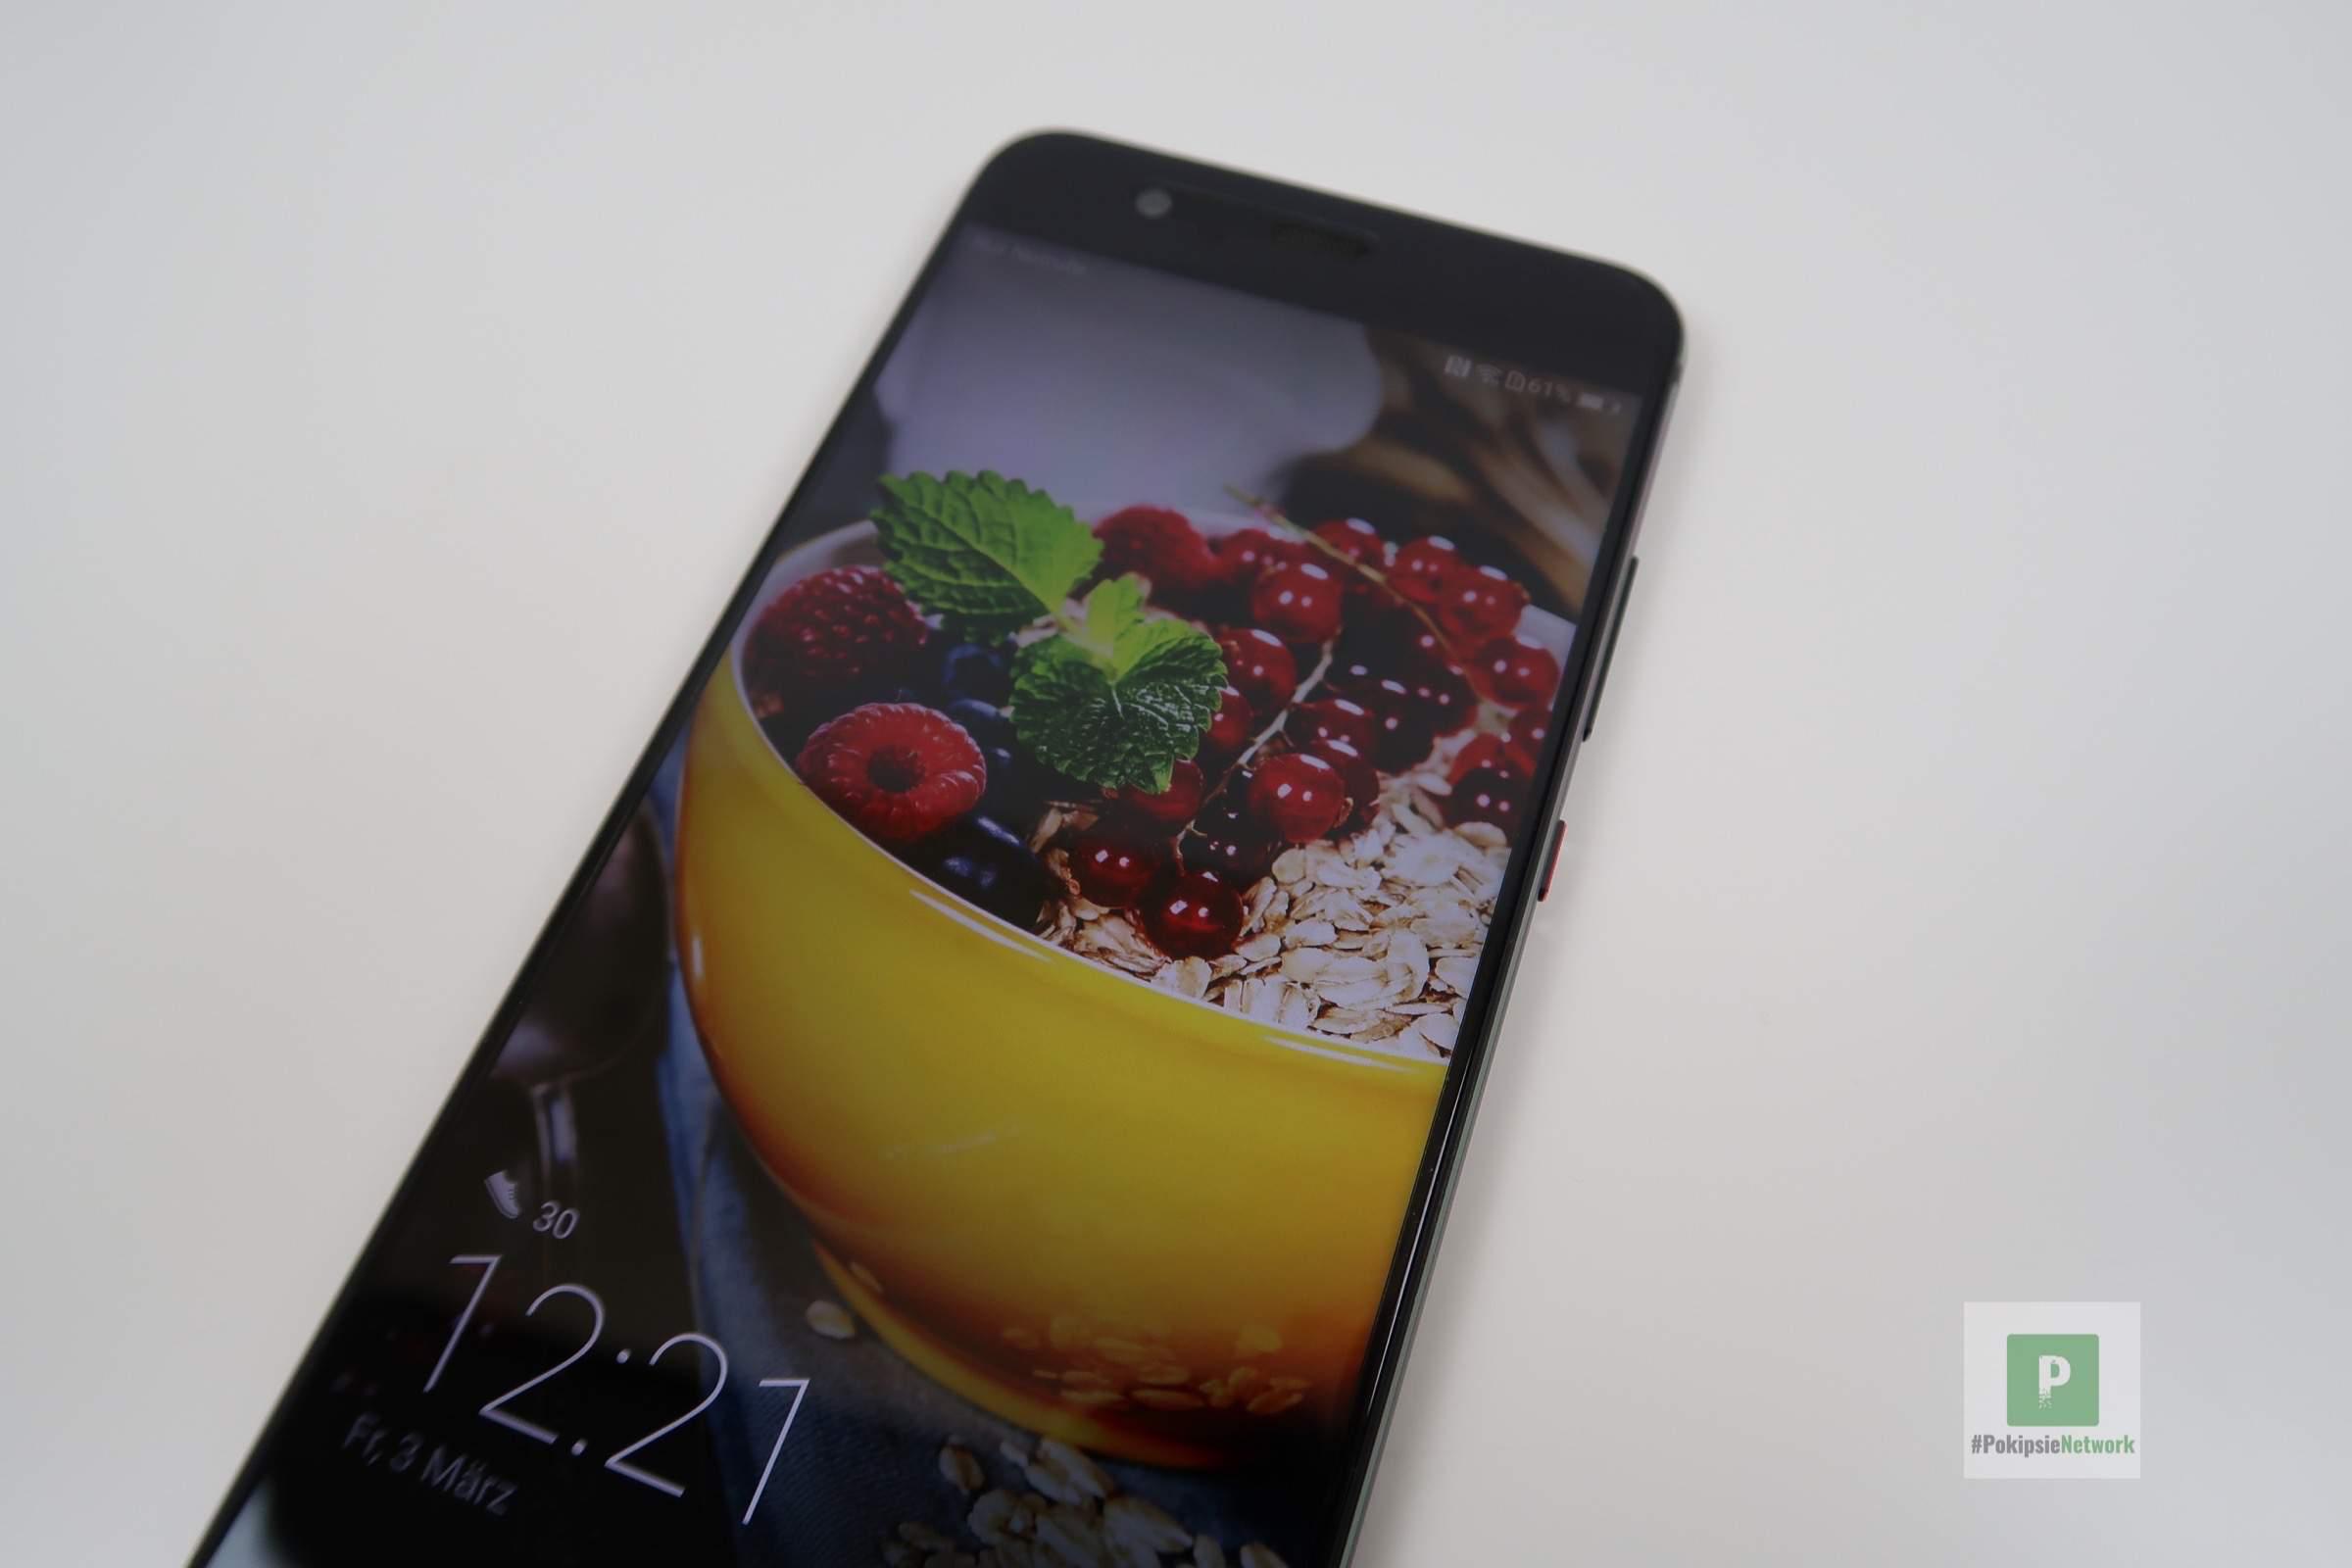 Huawei P10 Testbericht